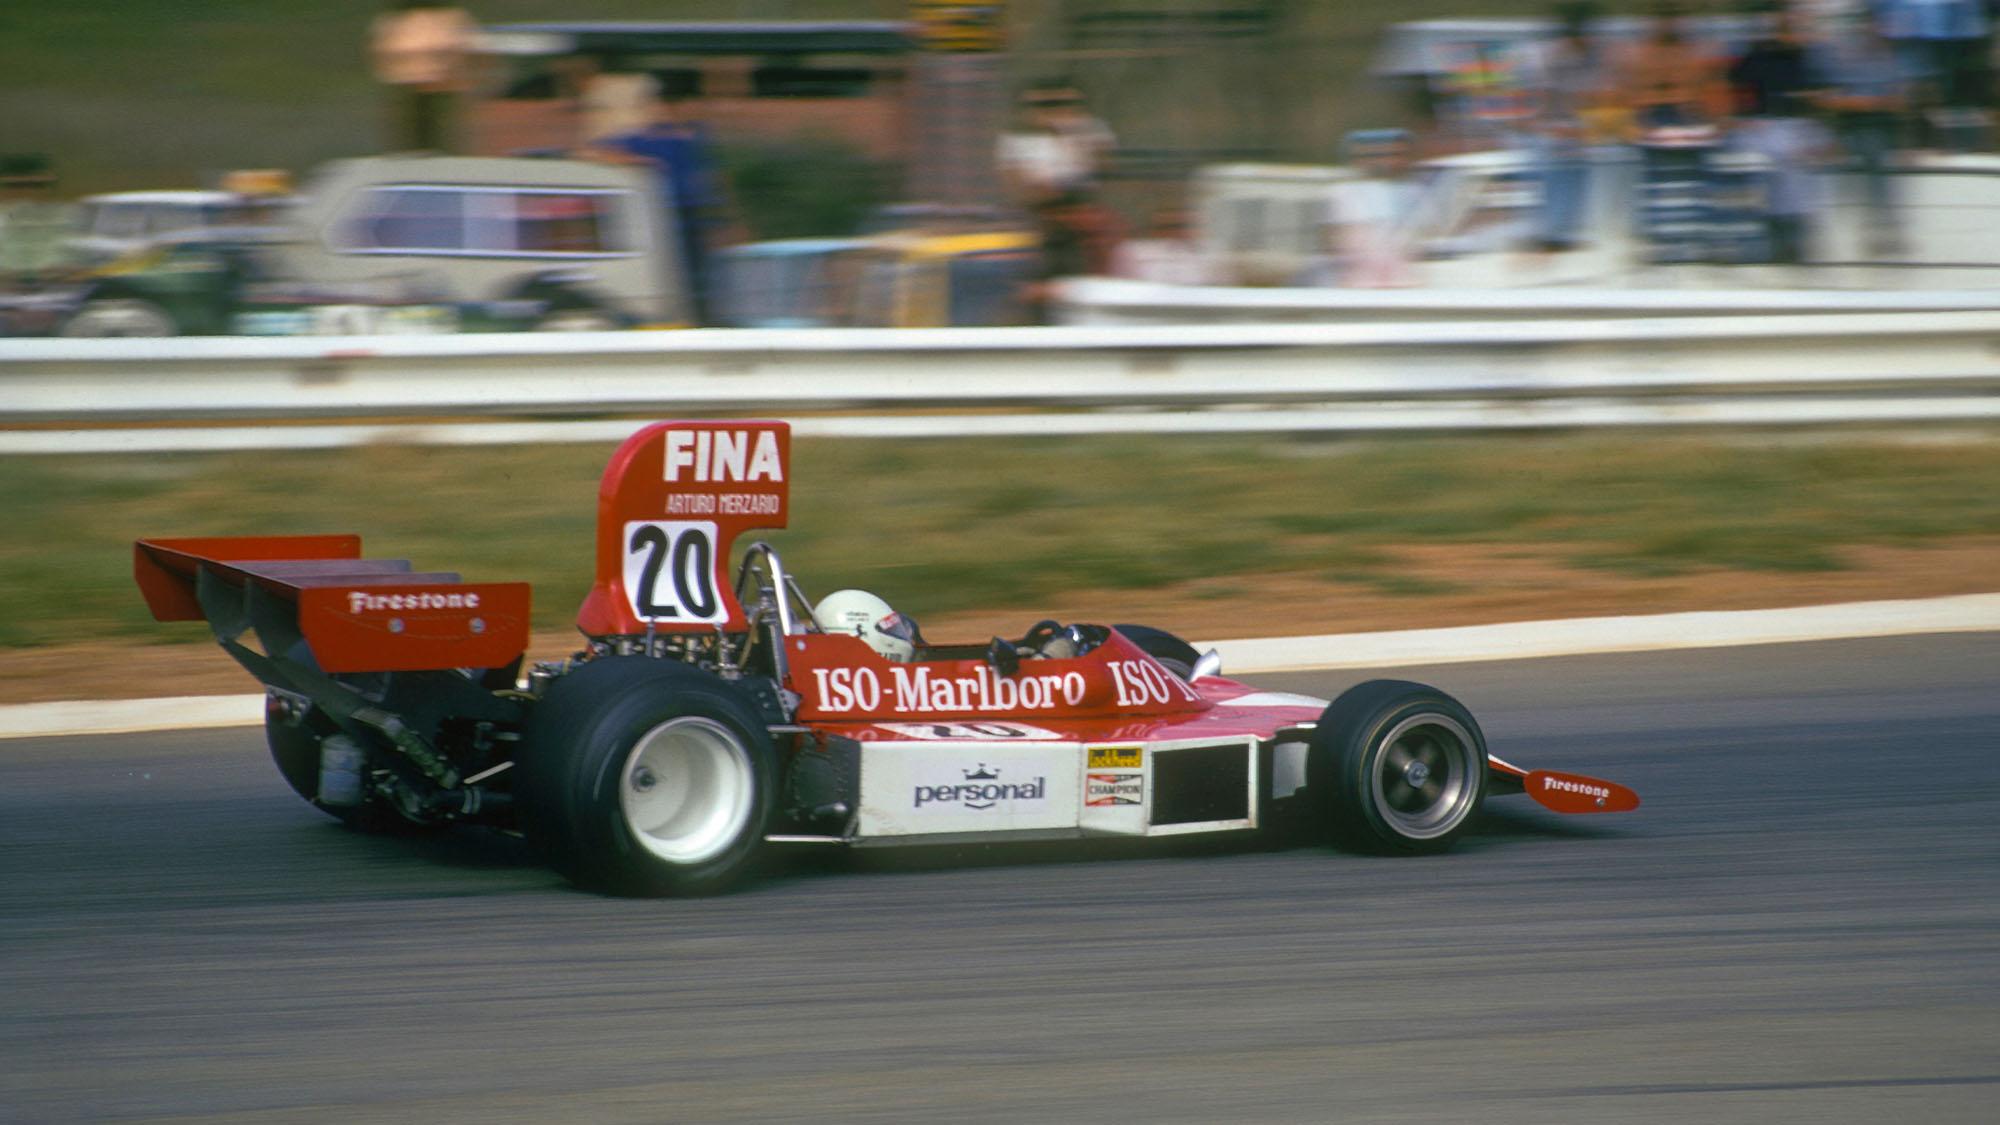 Arturo Merzario (Williams Iso-Ford) in the 1974 South African Grand Prix in Kyalami. Photo: Grand Prix Photo